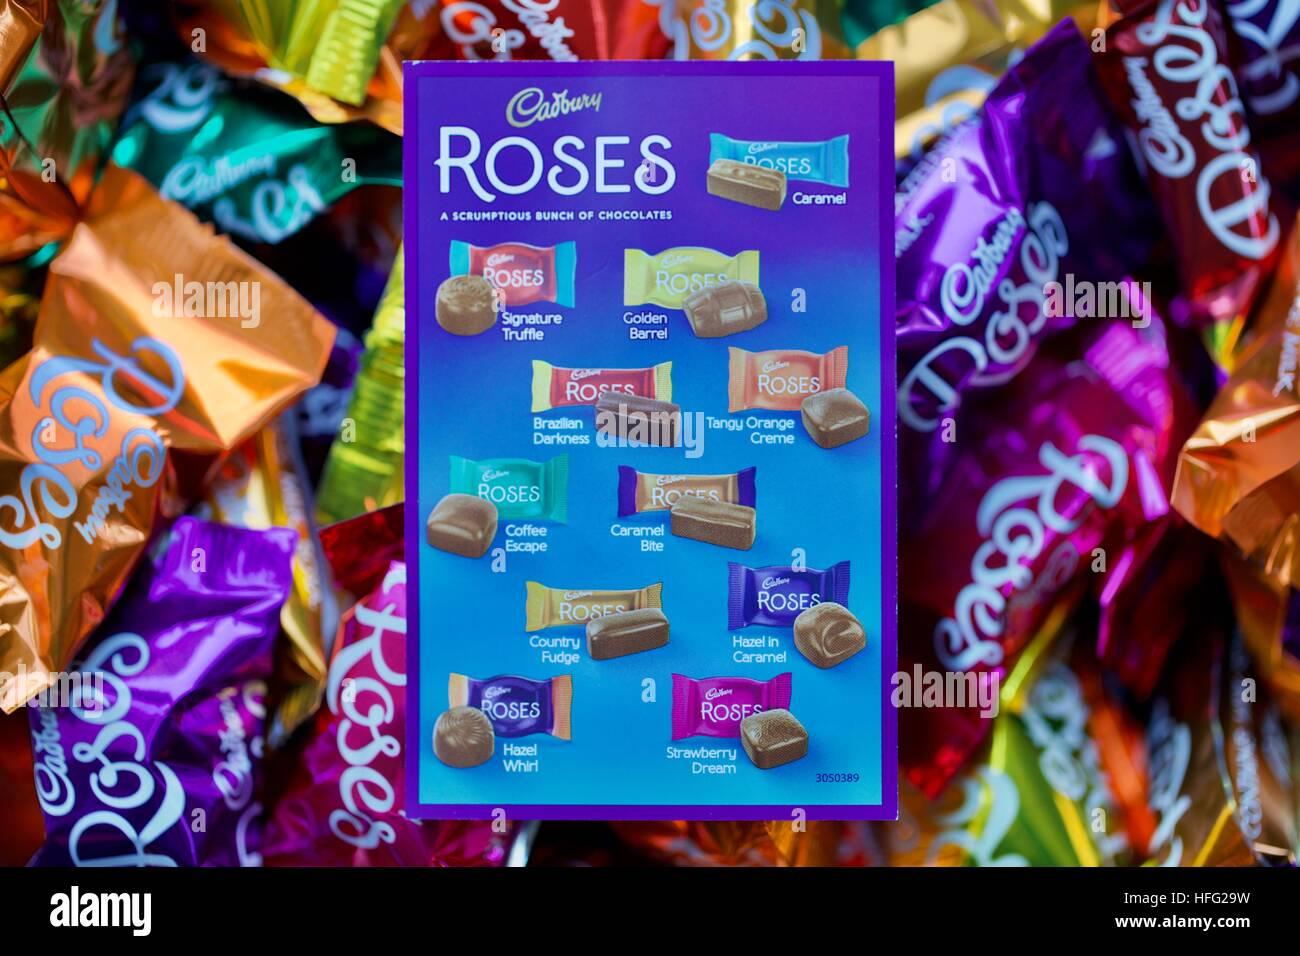 Cadbury Roses Chocolates - Stock Image